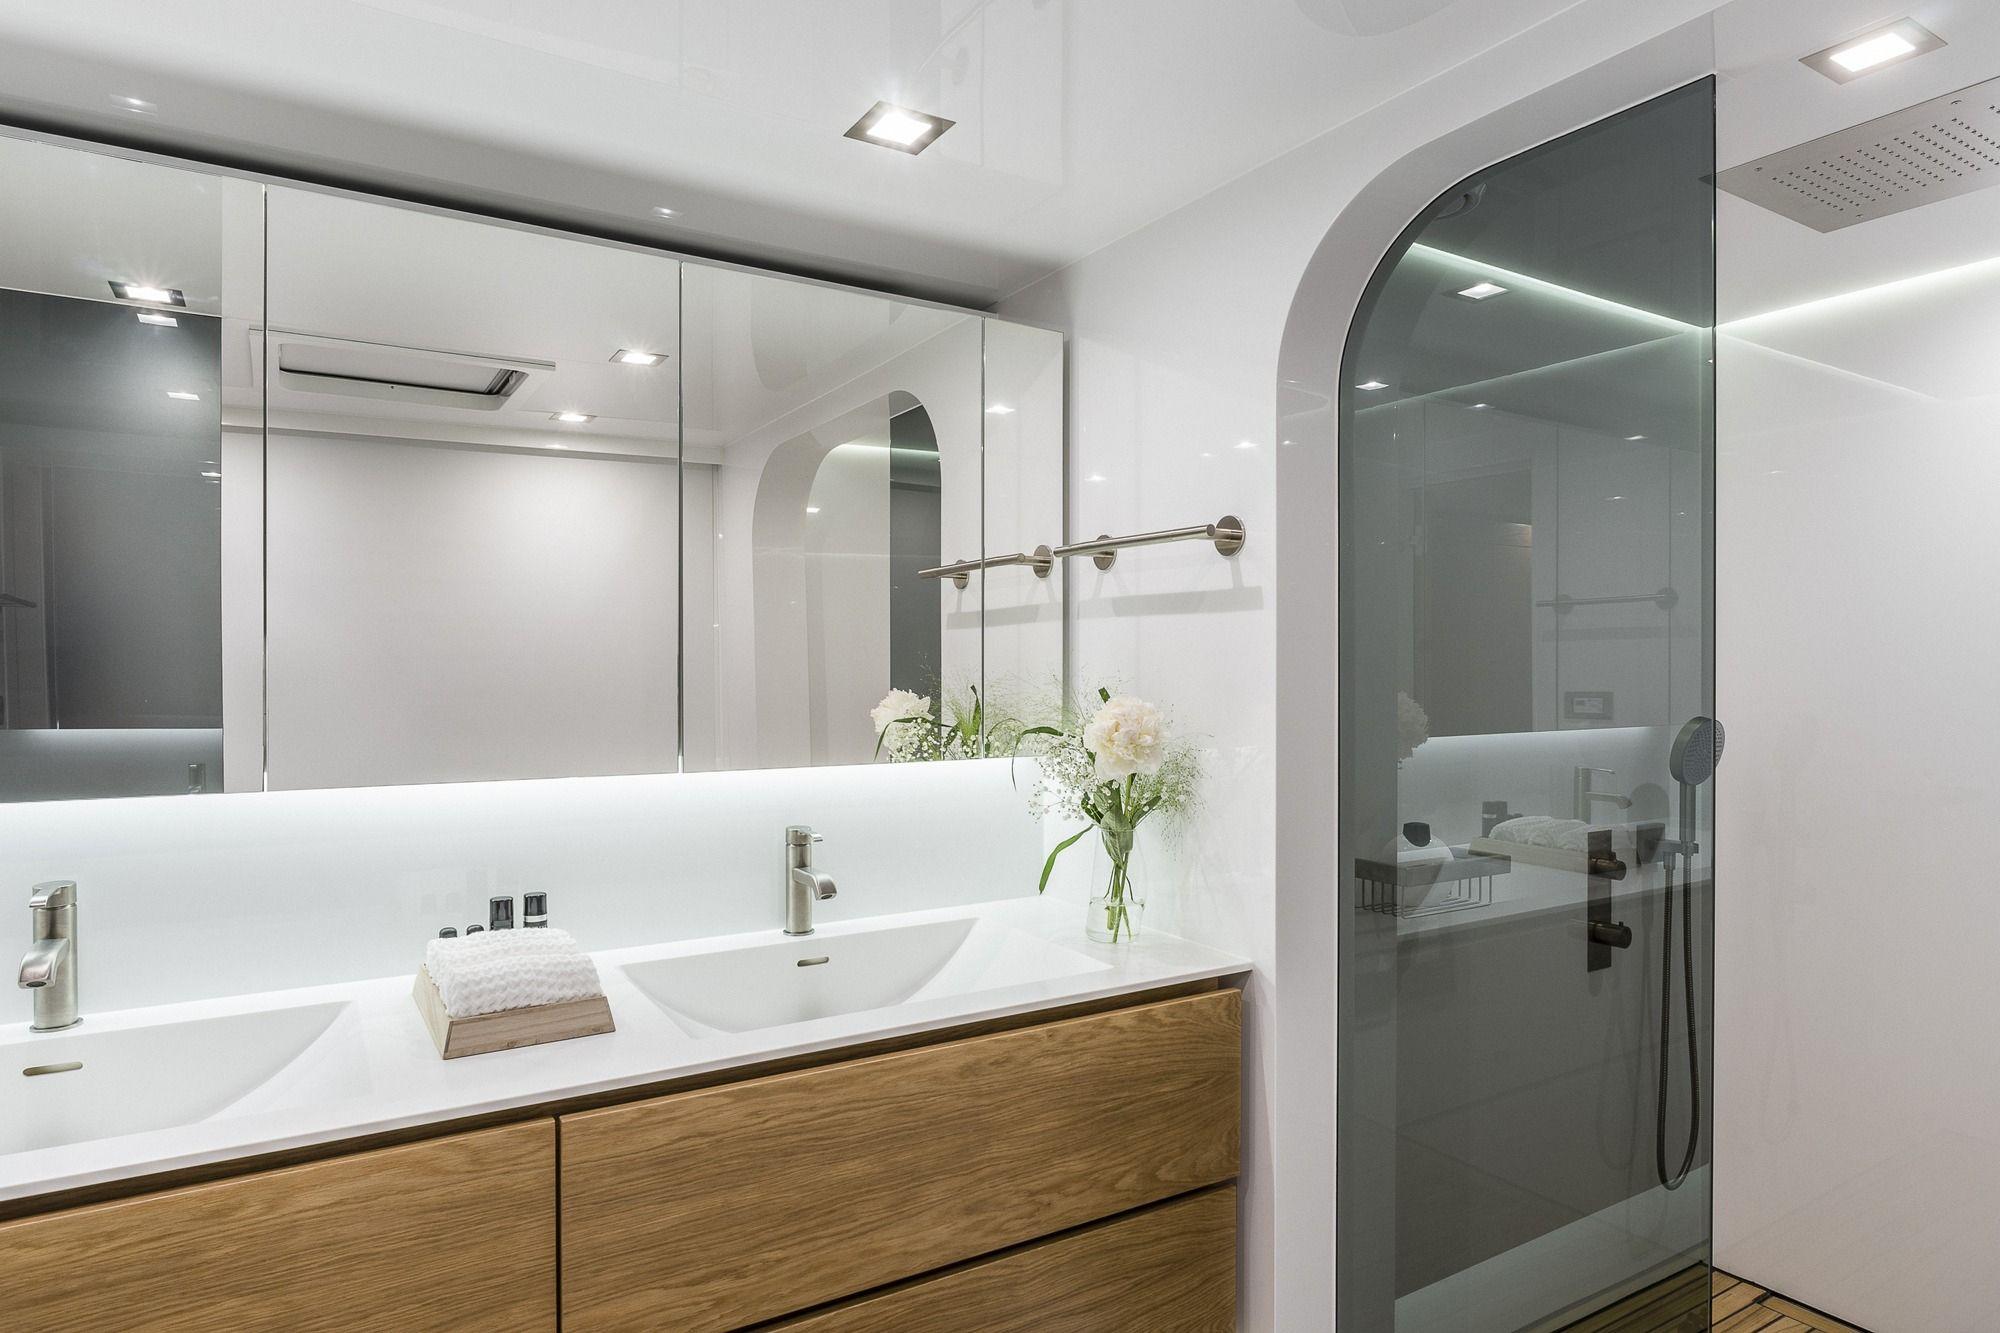 CALMAO Sunreef 74 Luxury Catamaran Master Bathroom